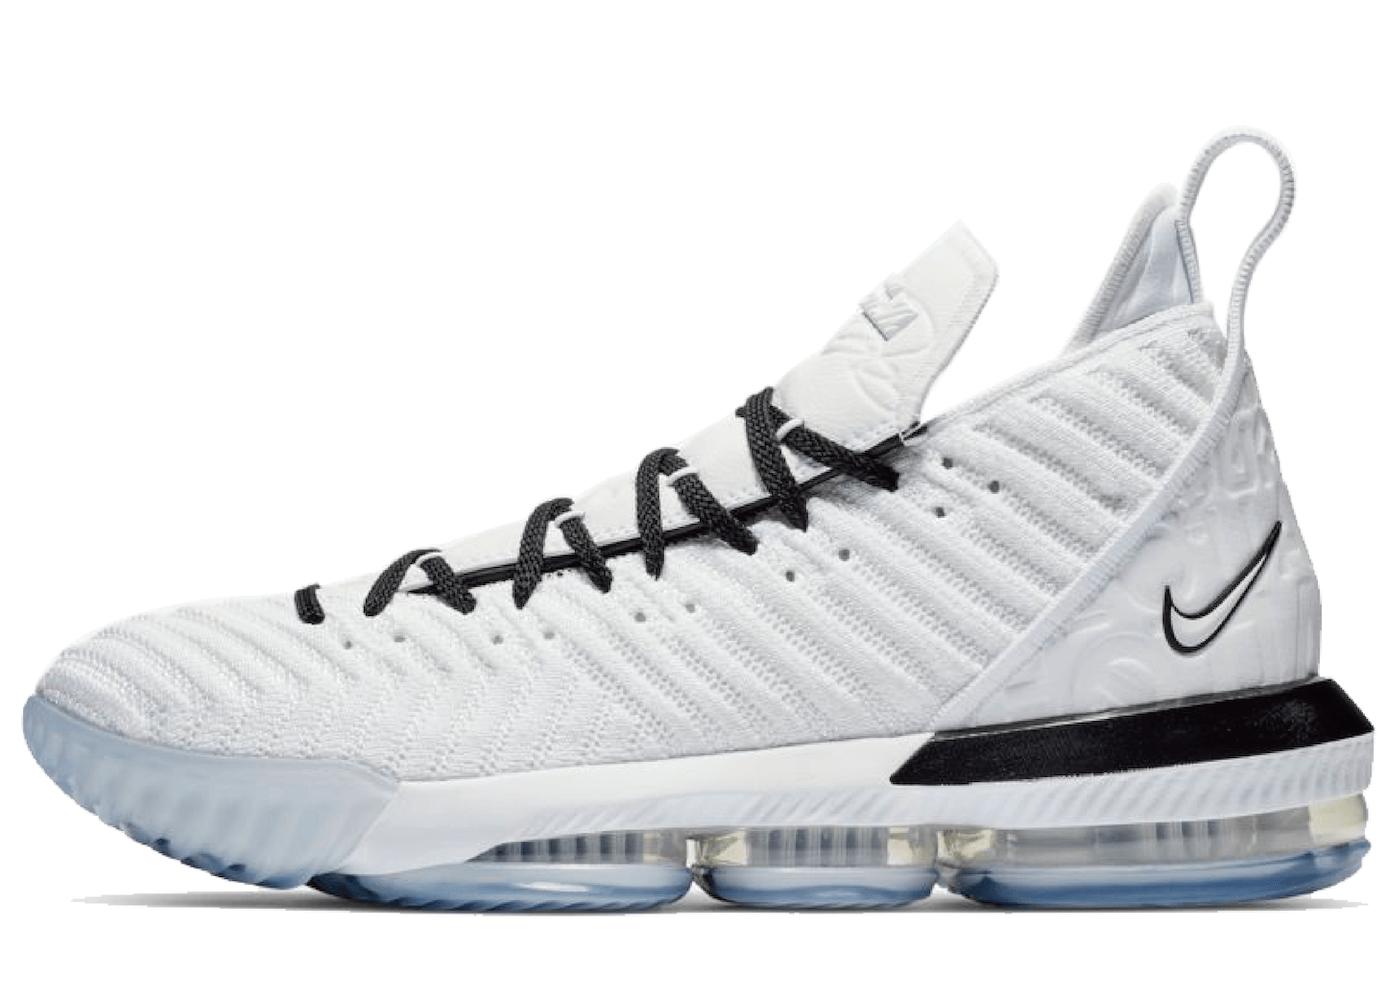 Nike LeBron 16 Equality White/Black (2019)の写真